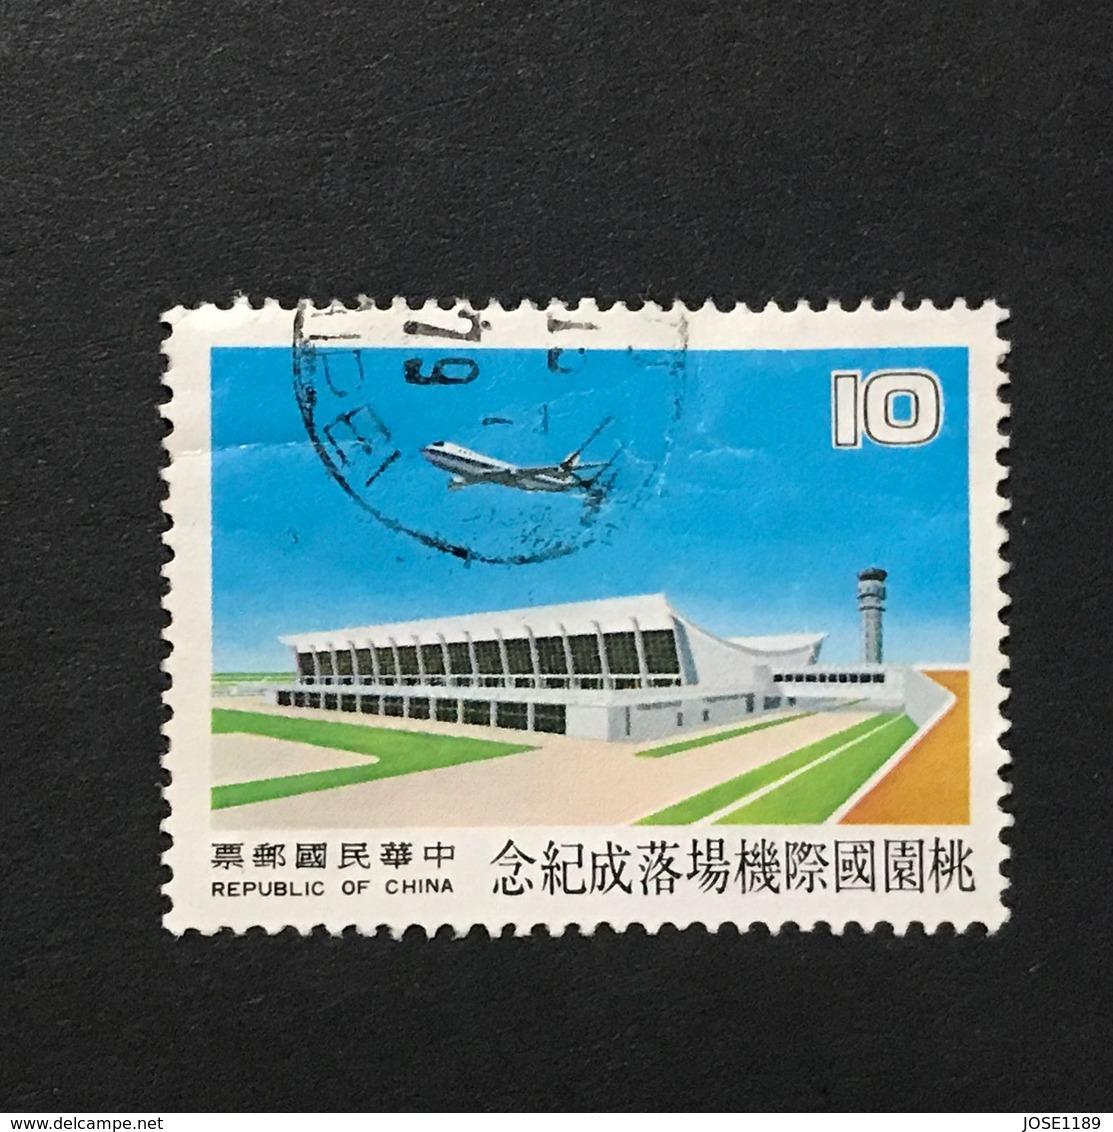 ◆◆◆Taiwán (Formosa)   1978  Completion Of Taoyuan Intl. Airport.    $10   USED  AA2366 - 1945-... República De China